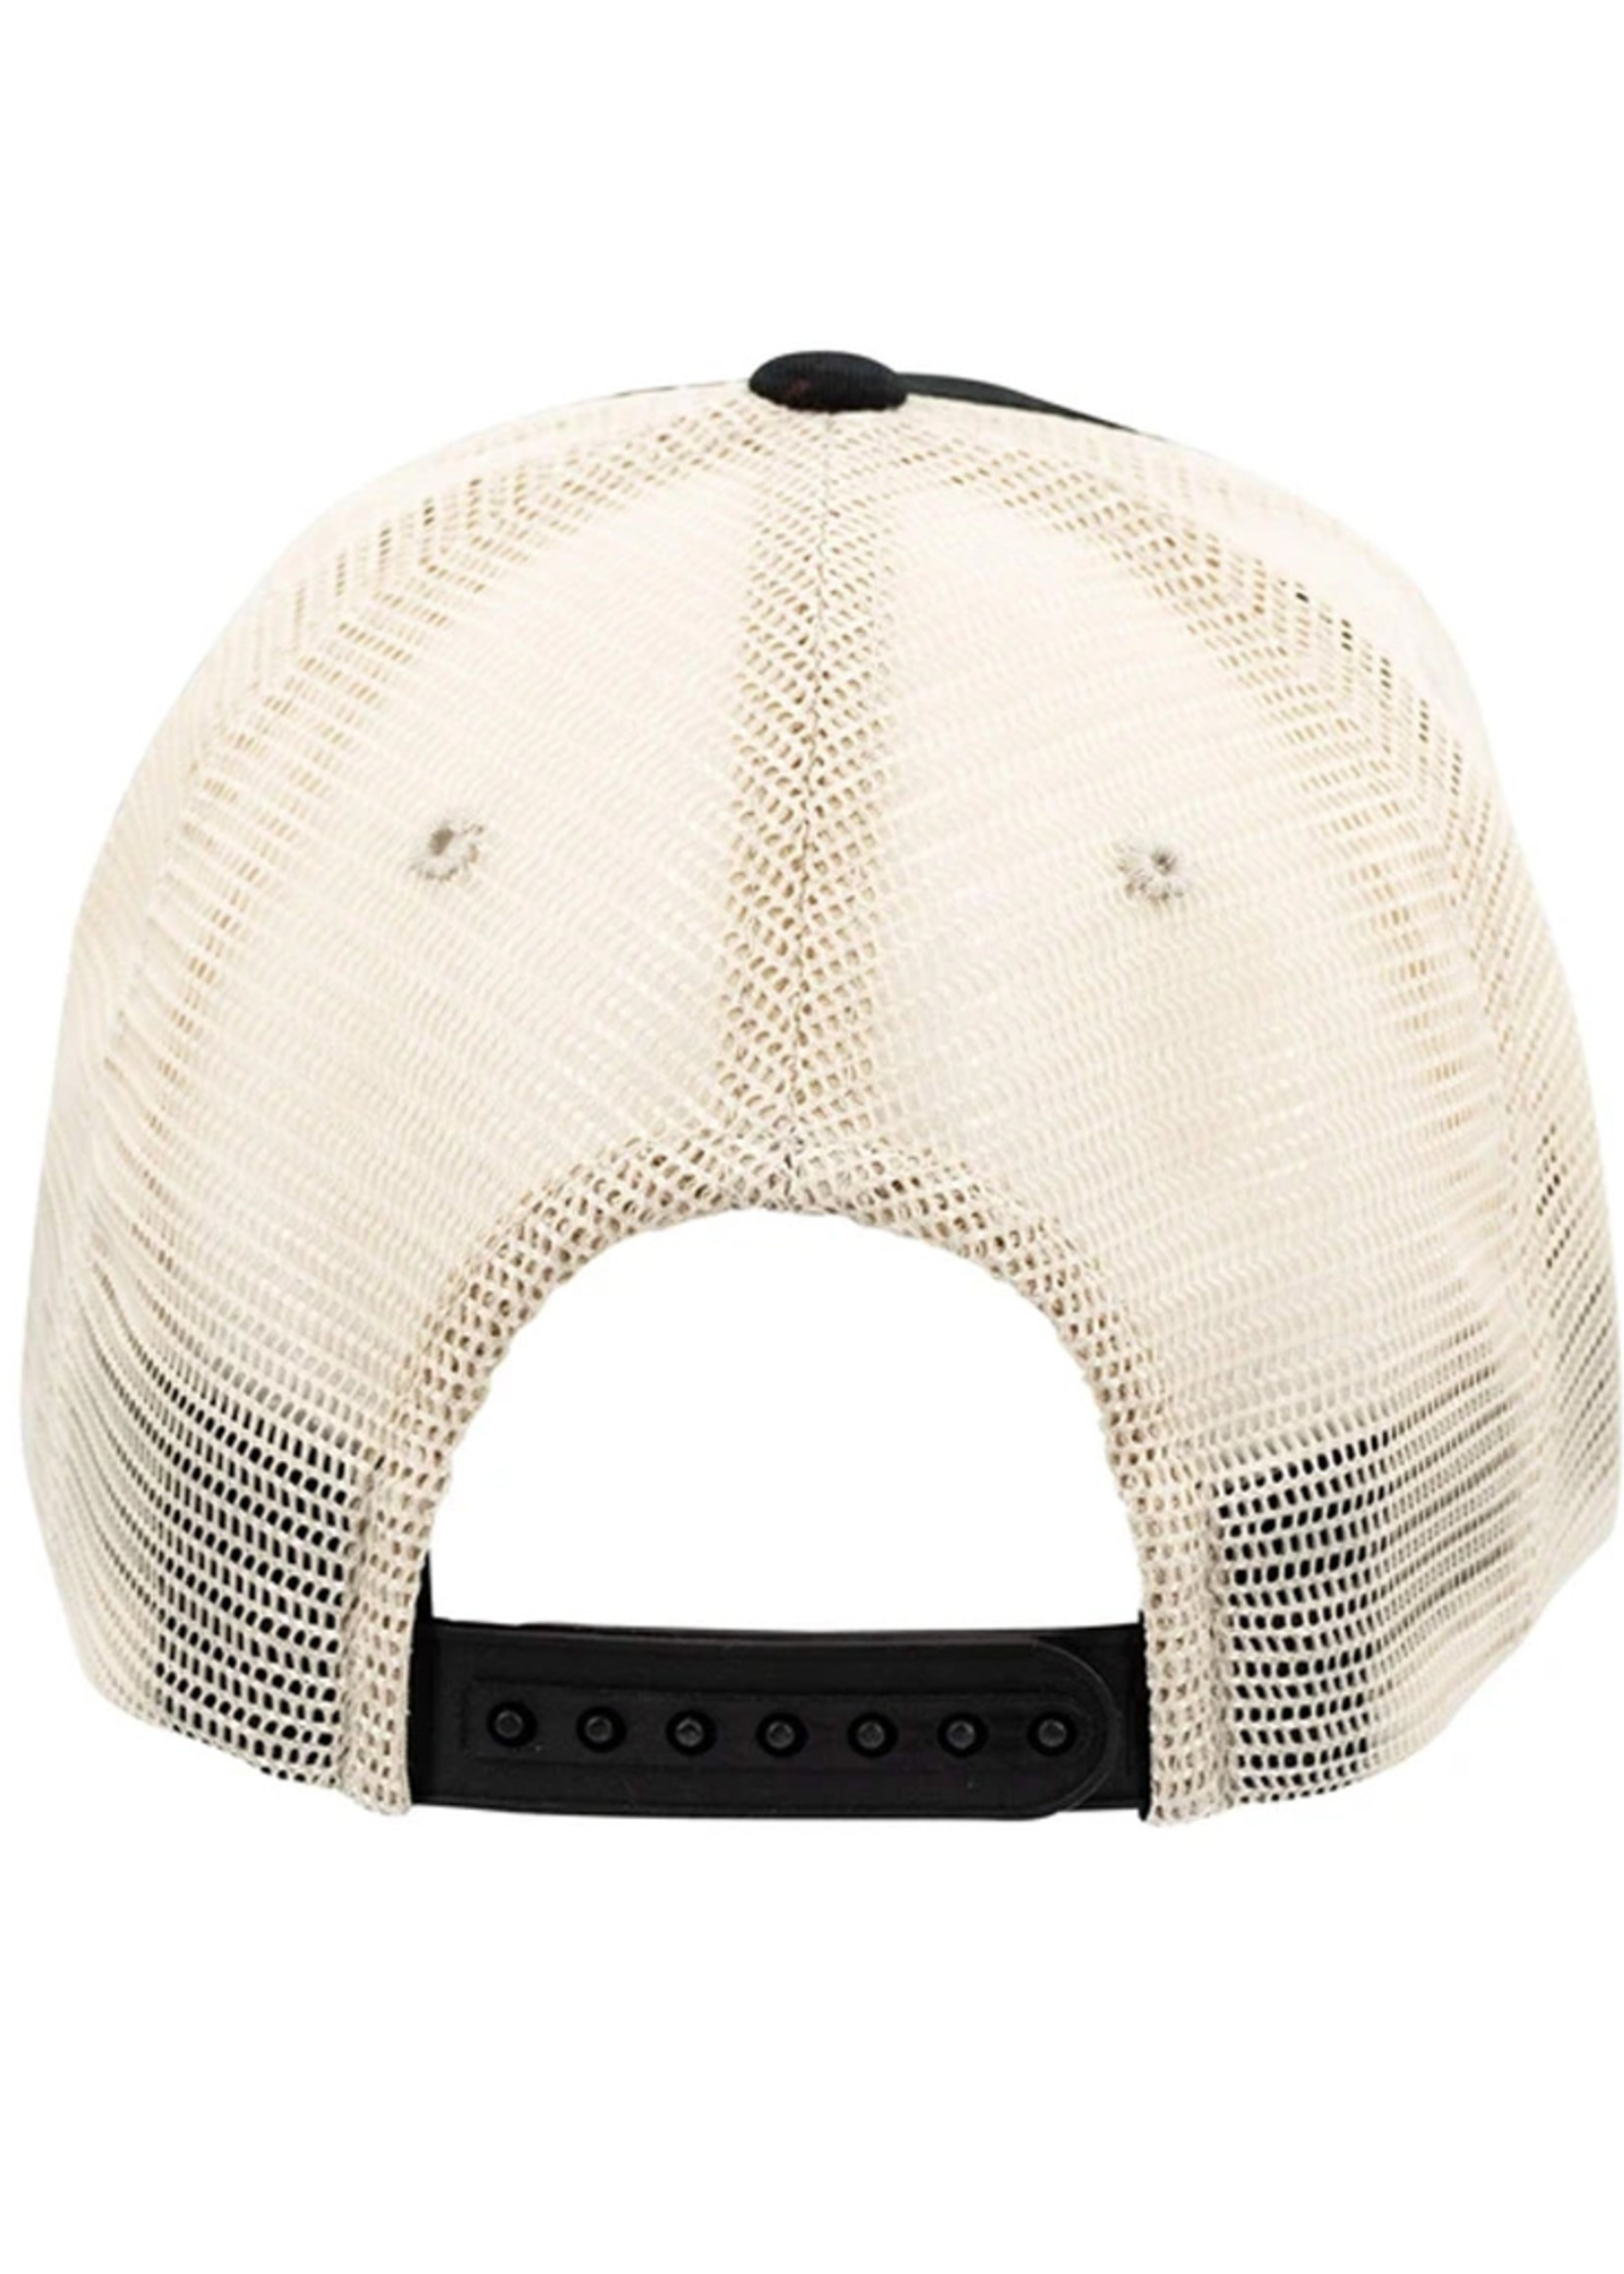 Ohio State Buckeyes Black and Tan Mesh Adjustable Hat